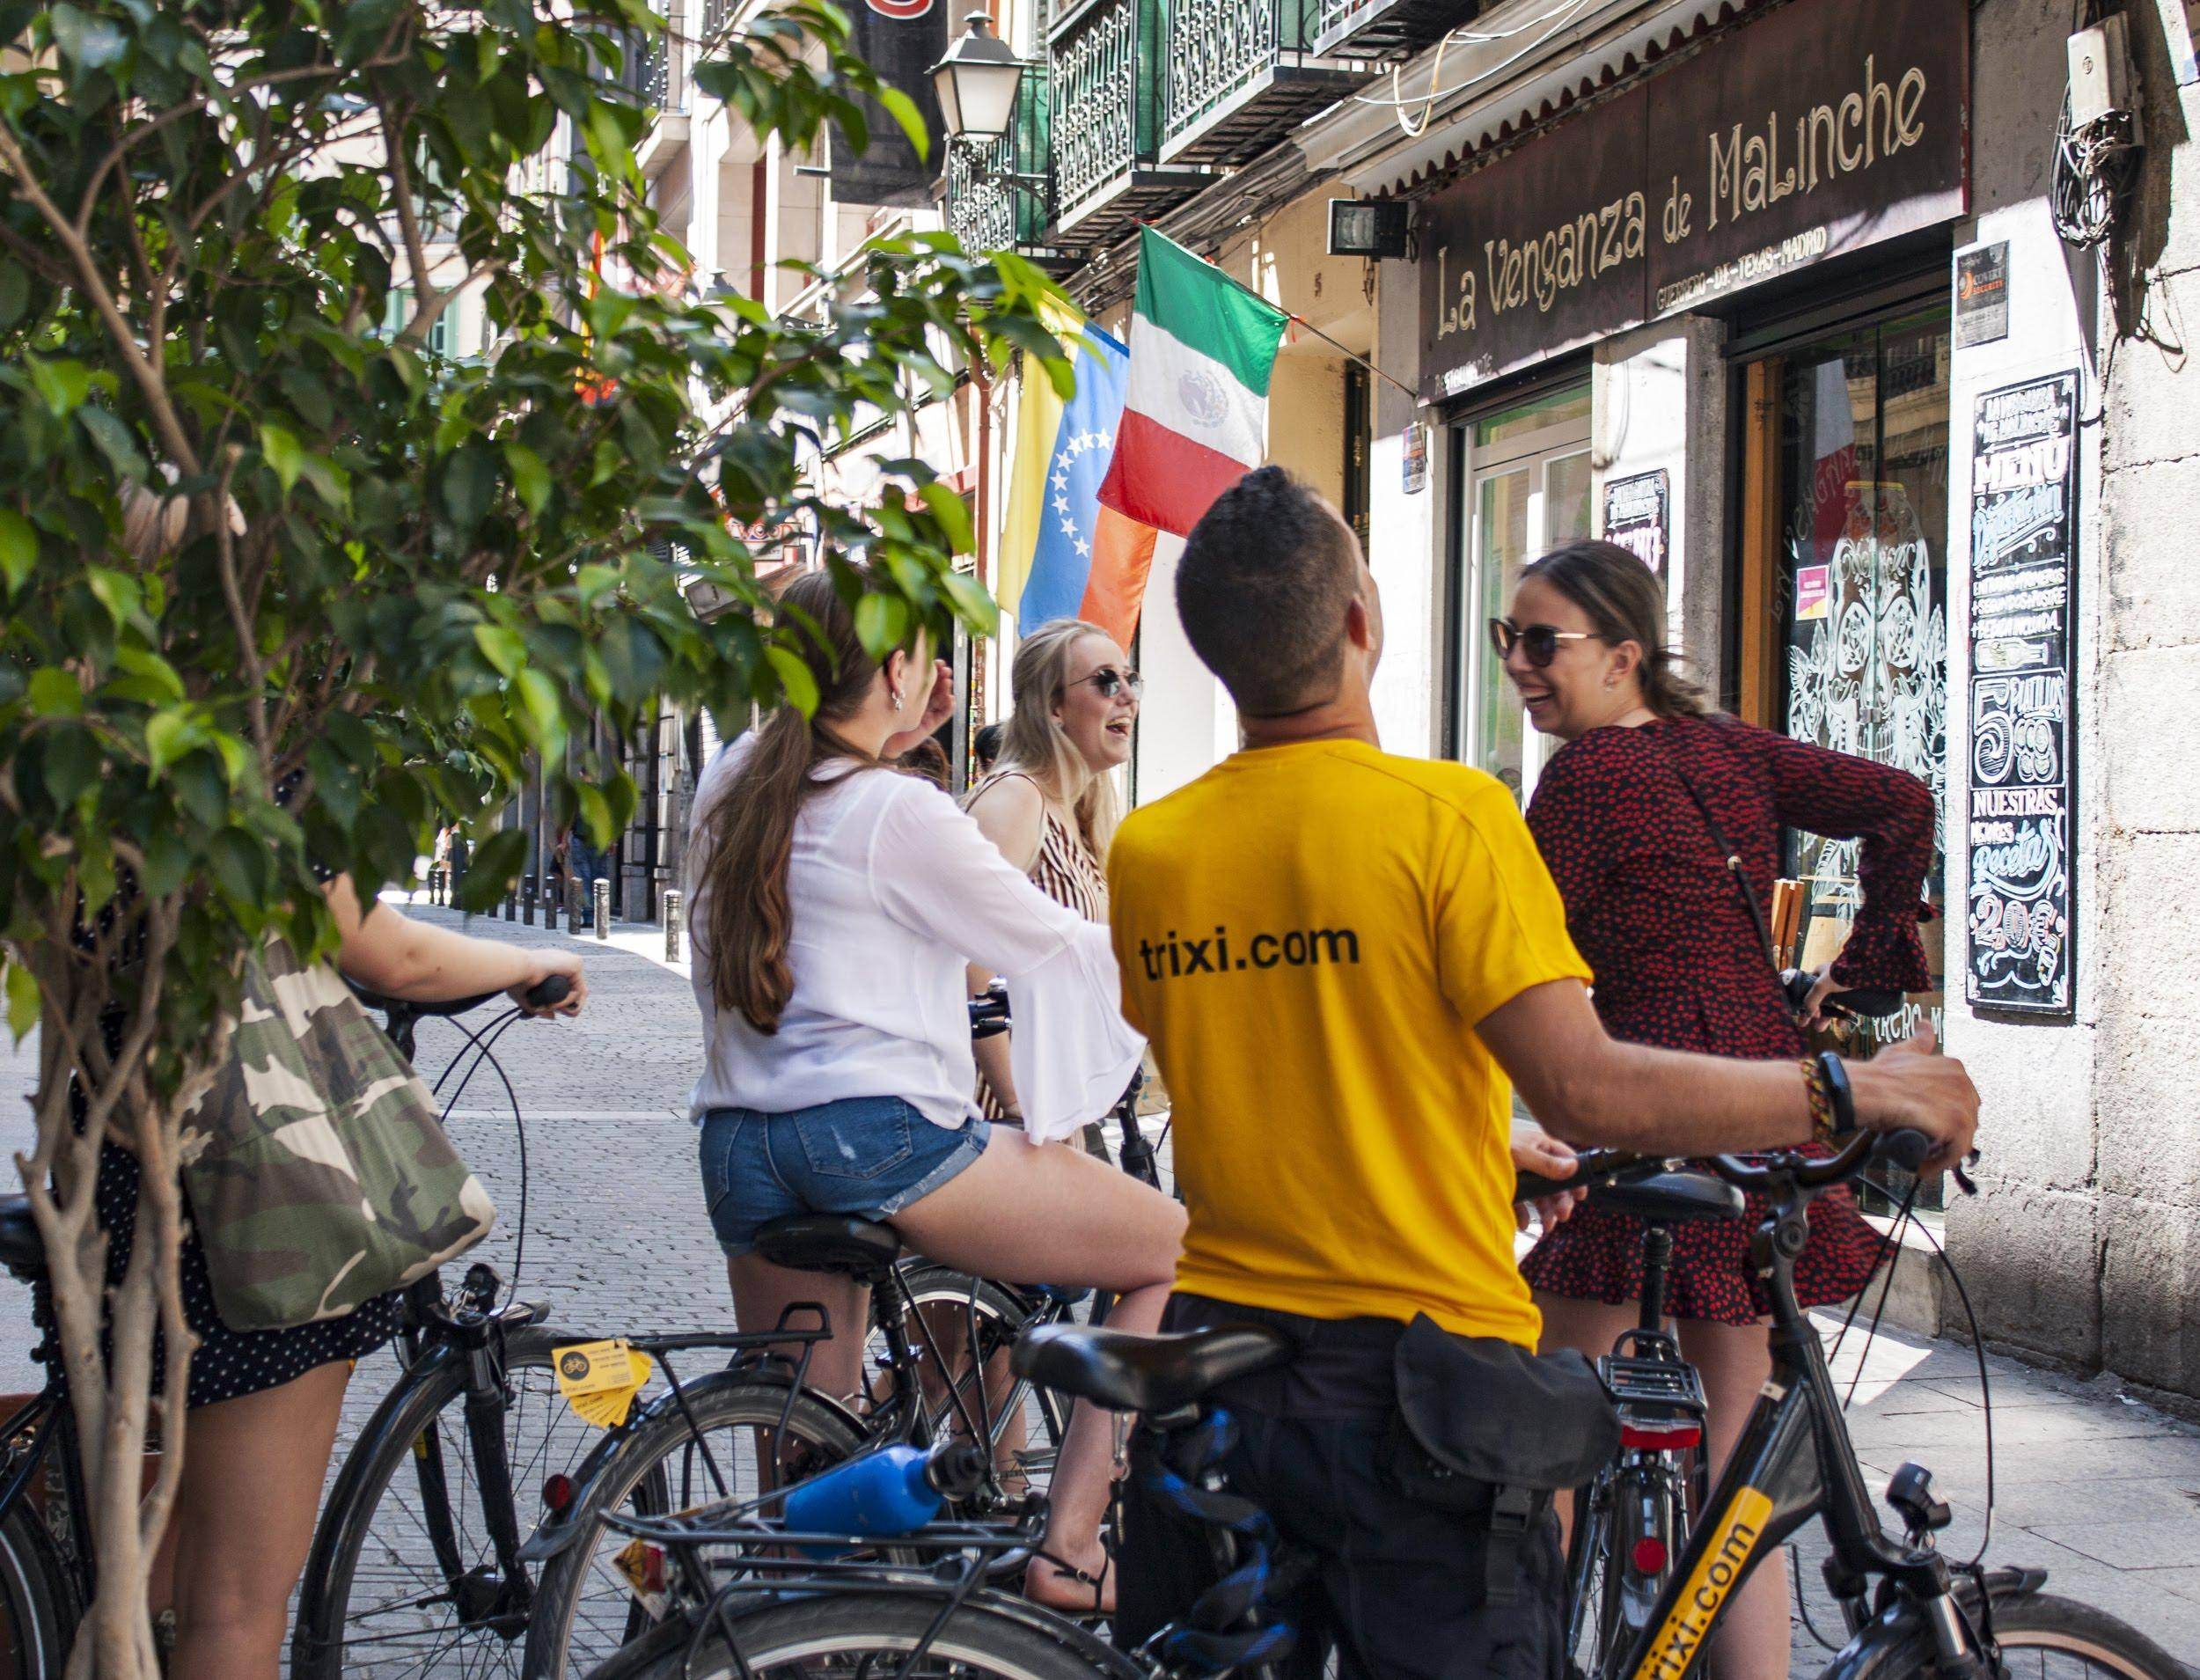 Trixi Madrid - Tour en bicicleta a medida